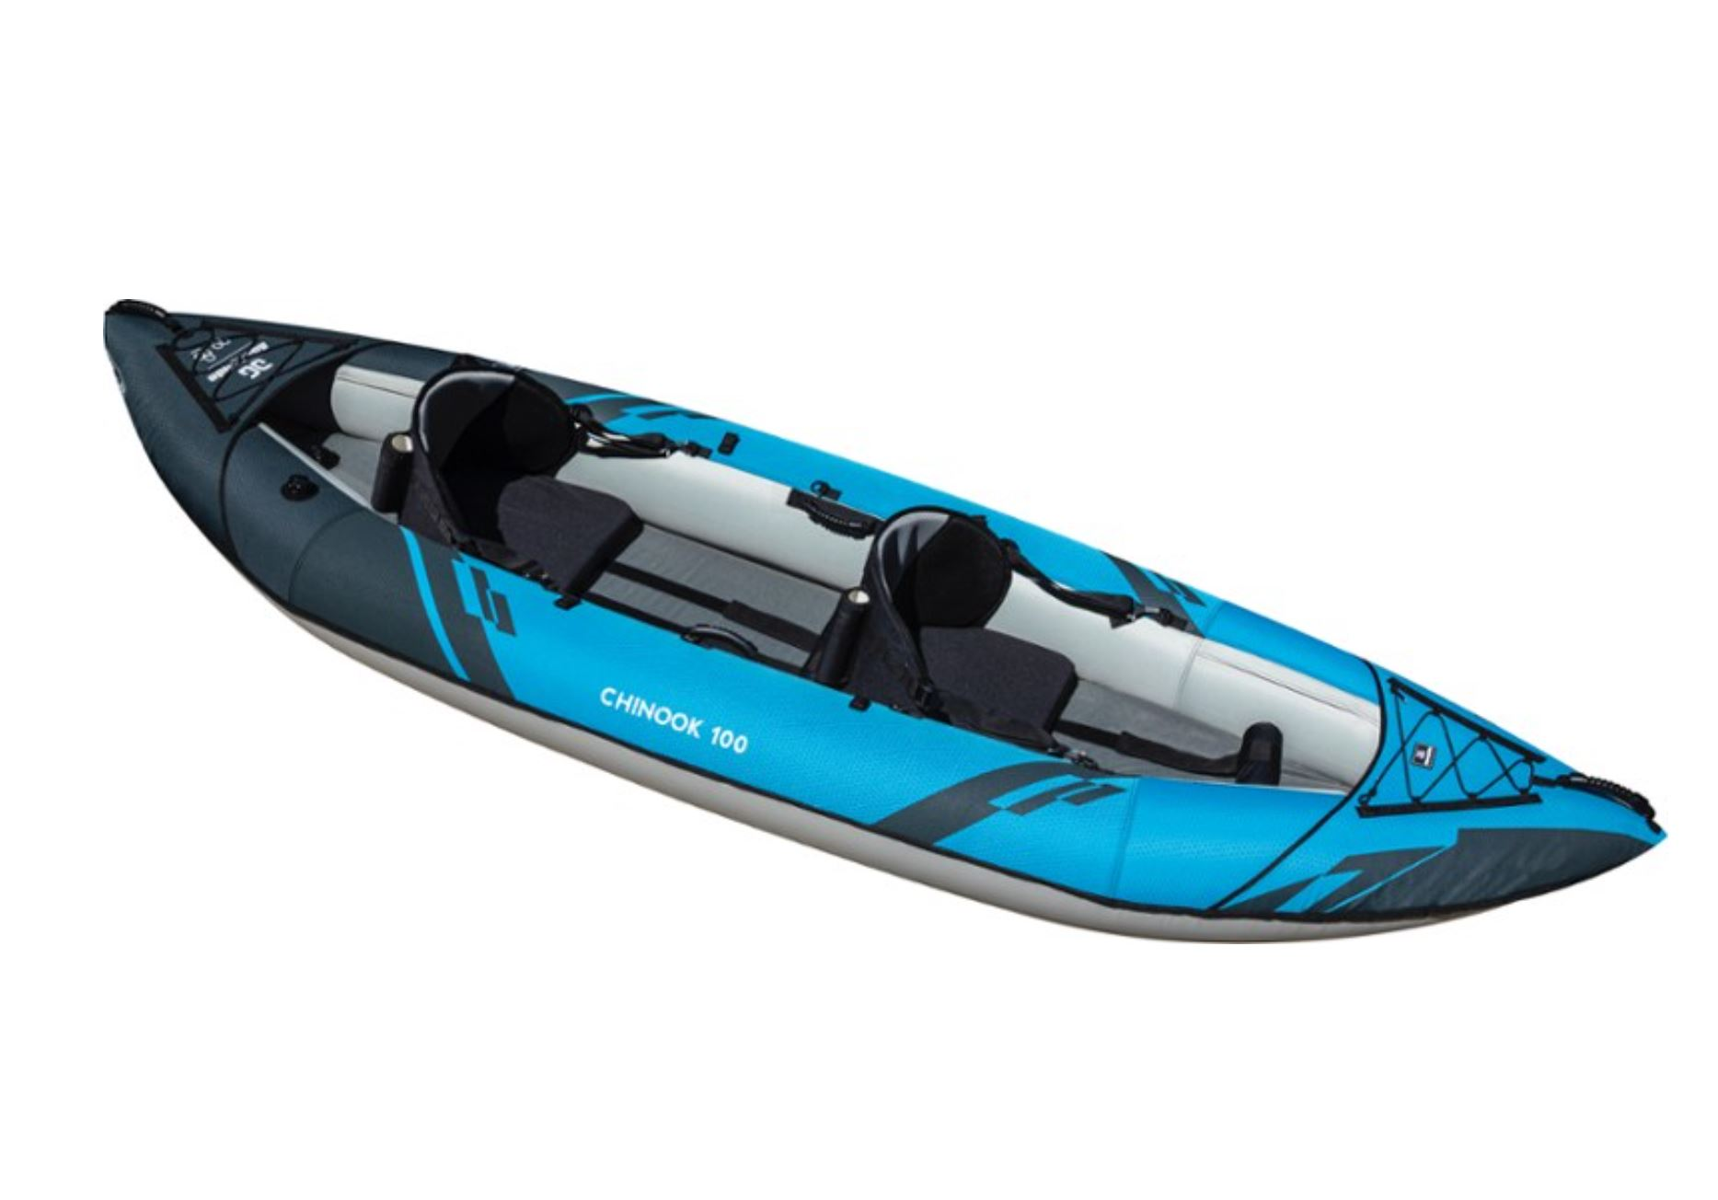 aquaglide chinook inflatable kayak